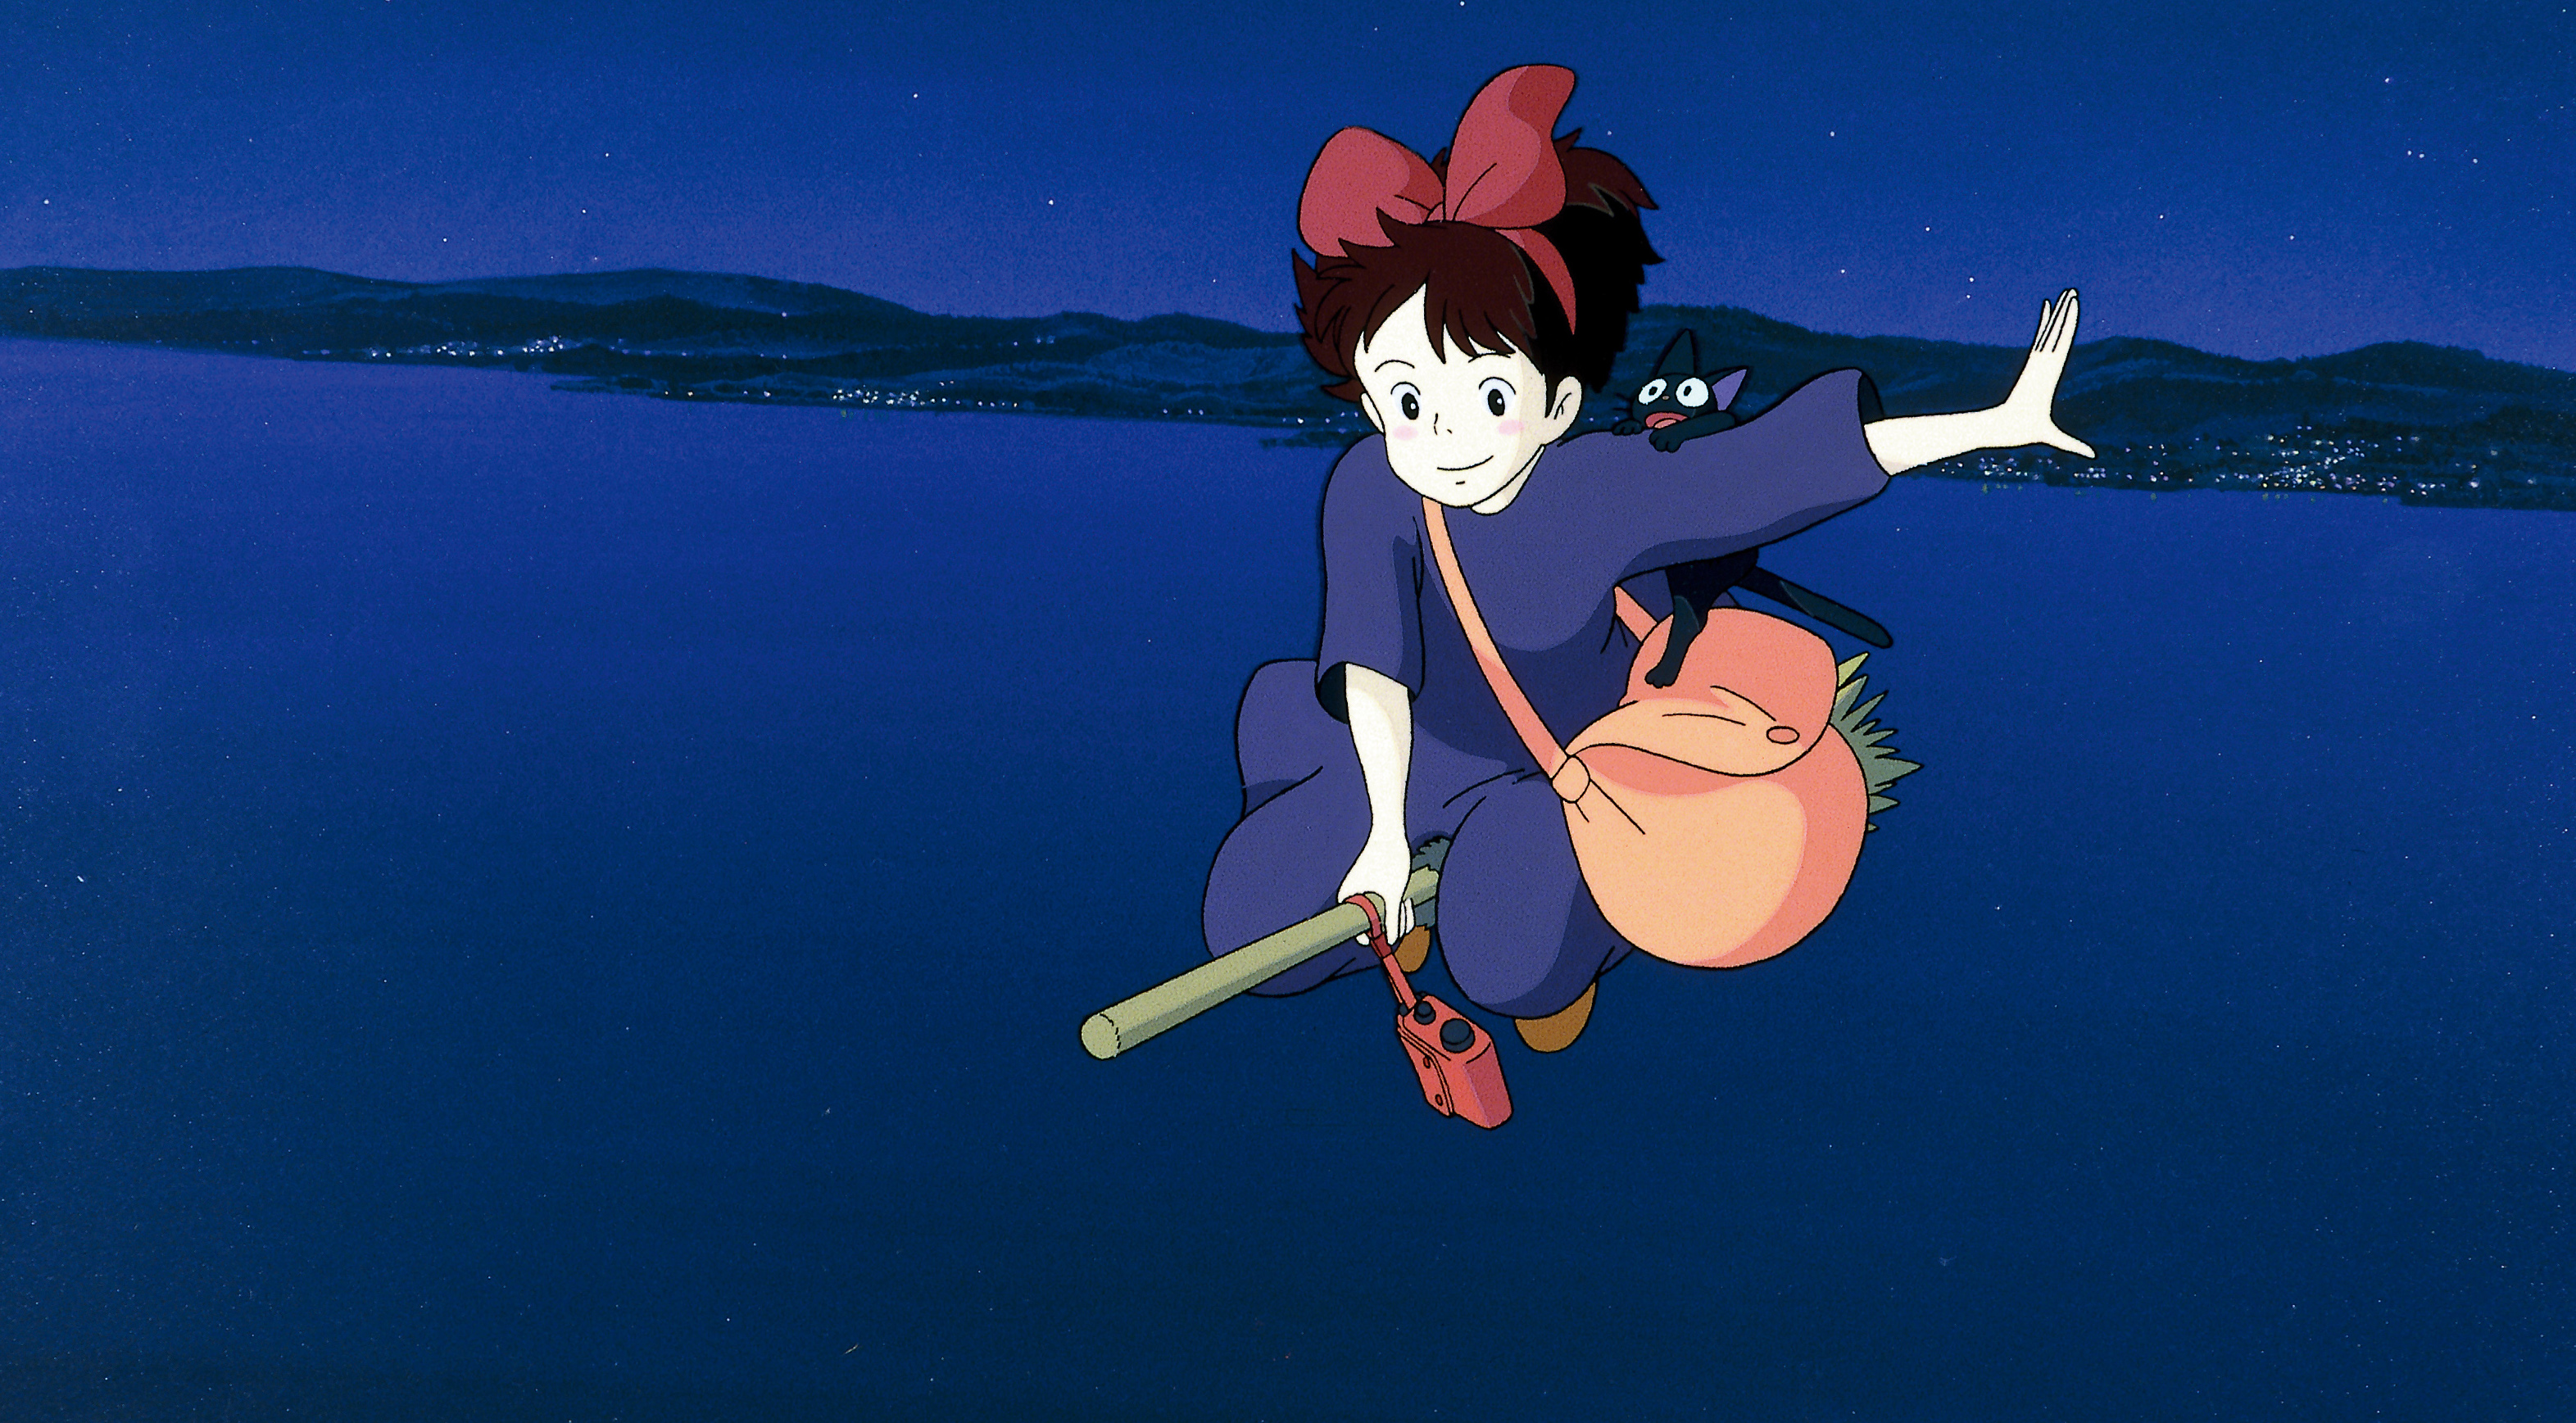 kiki flying on her broom at night